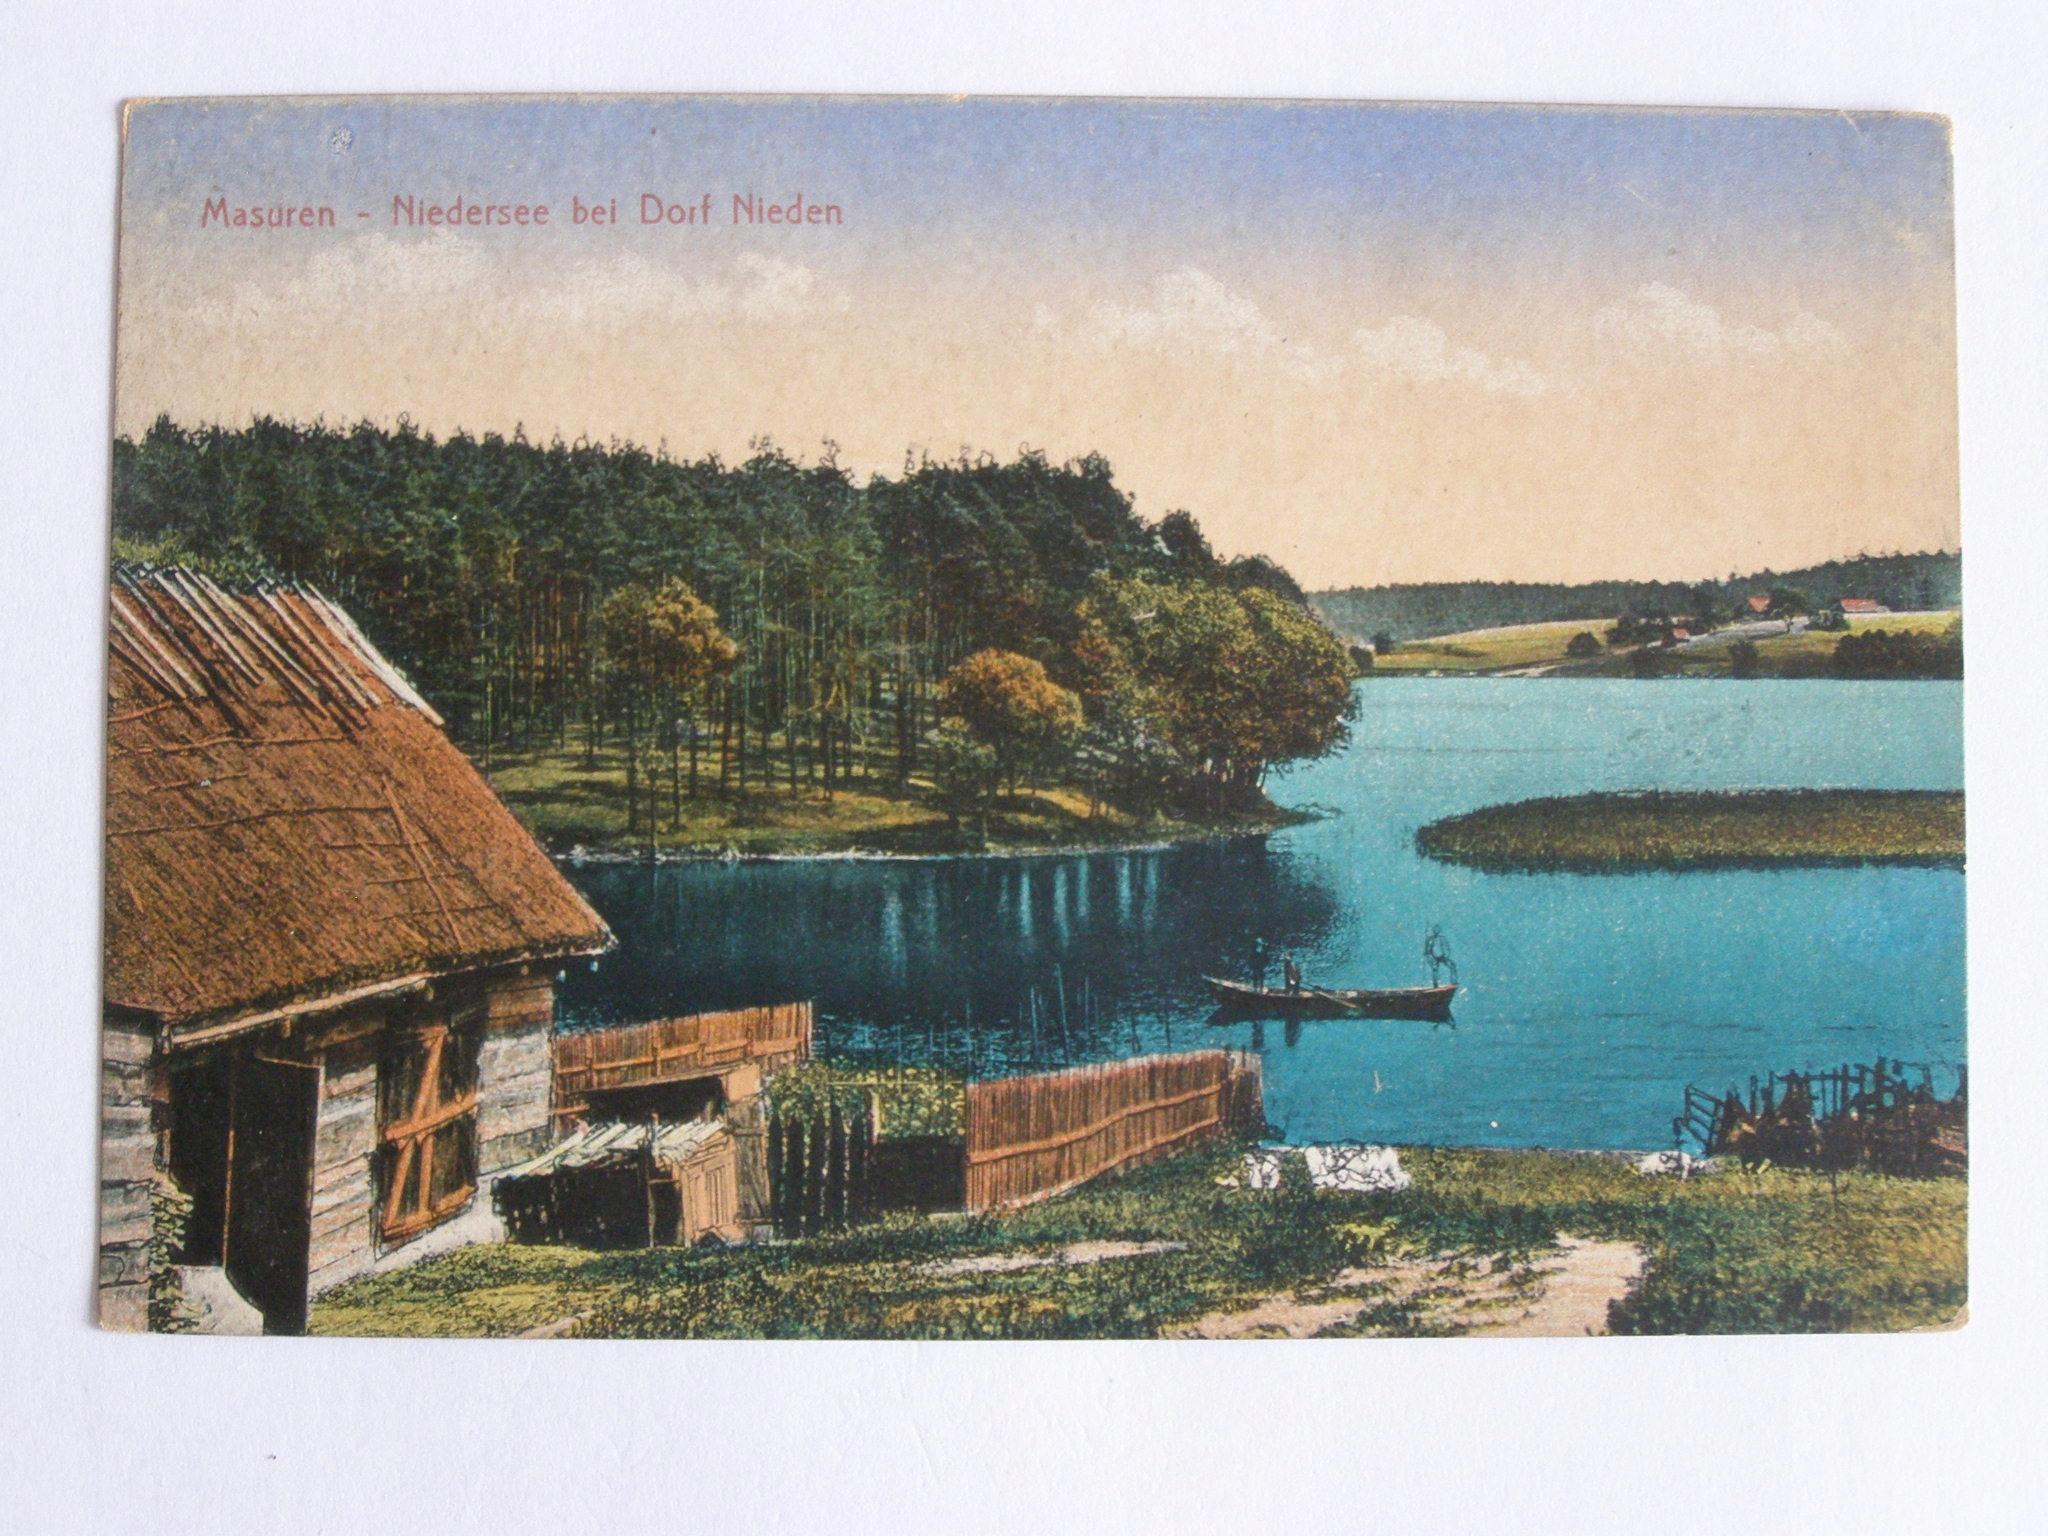 Озеро Нидзкие Мазурии, село Нида около 1915 г.